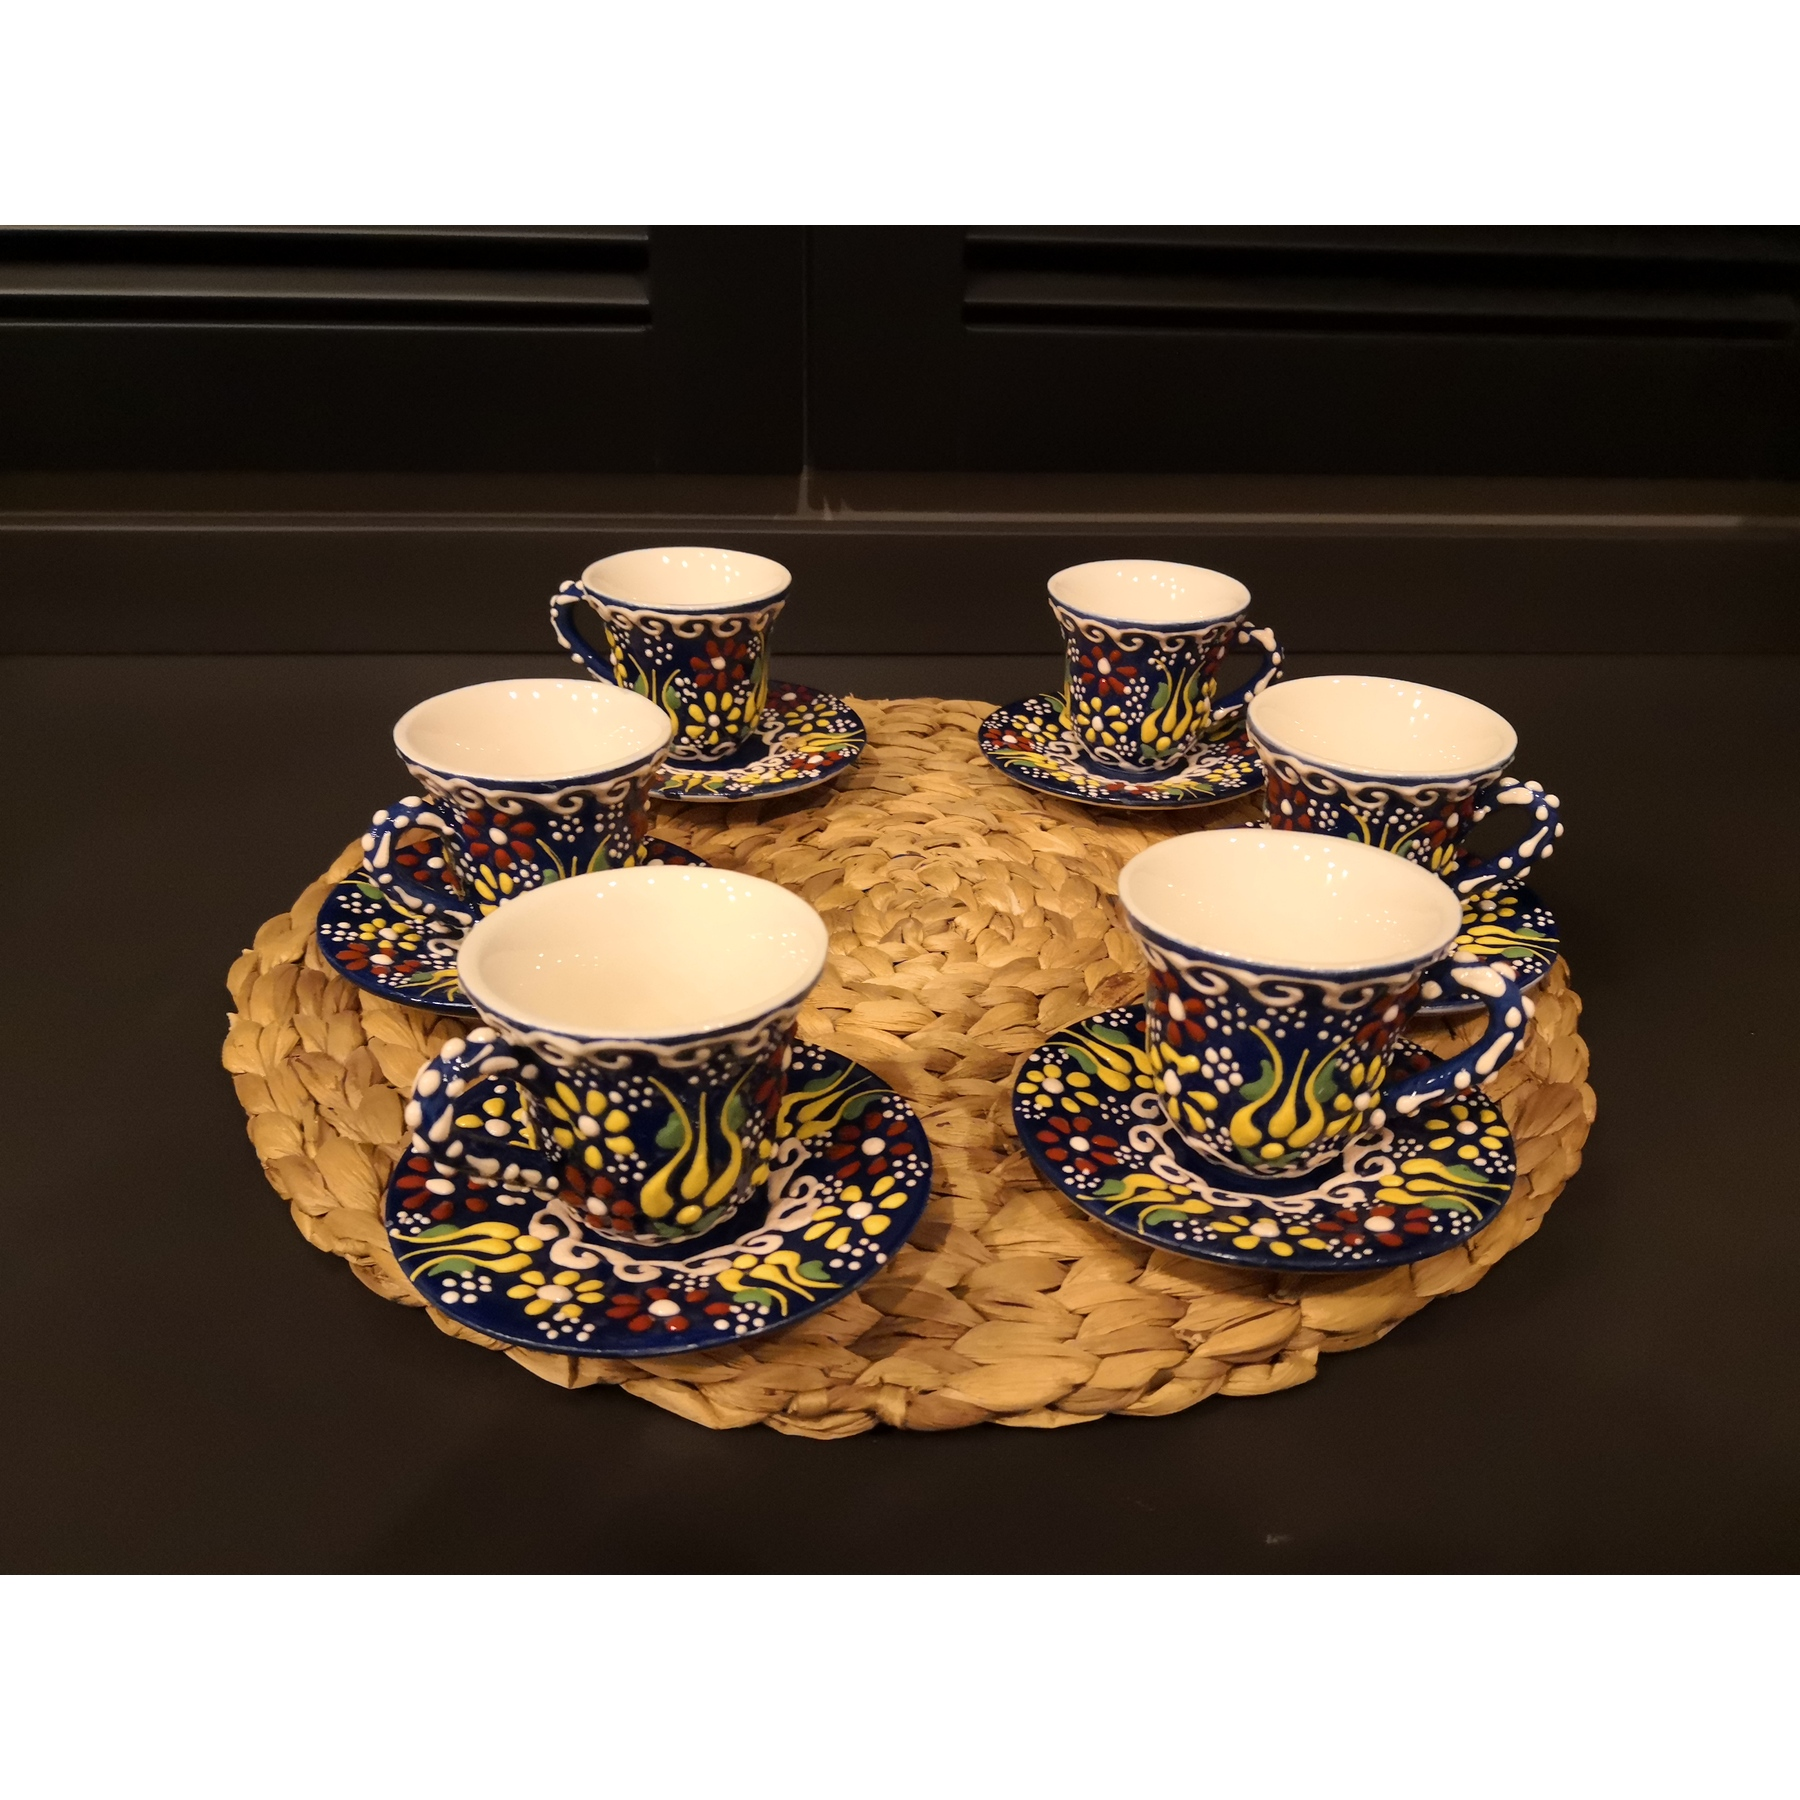 Set Of 6 Ceramic Ottoman Turkish Coffee Cups Set With Turkish Coffee Gift Made In Turkey Arabic Coffee Set Tea Cups Set Espresso